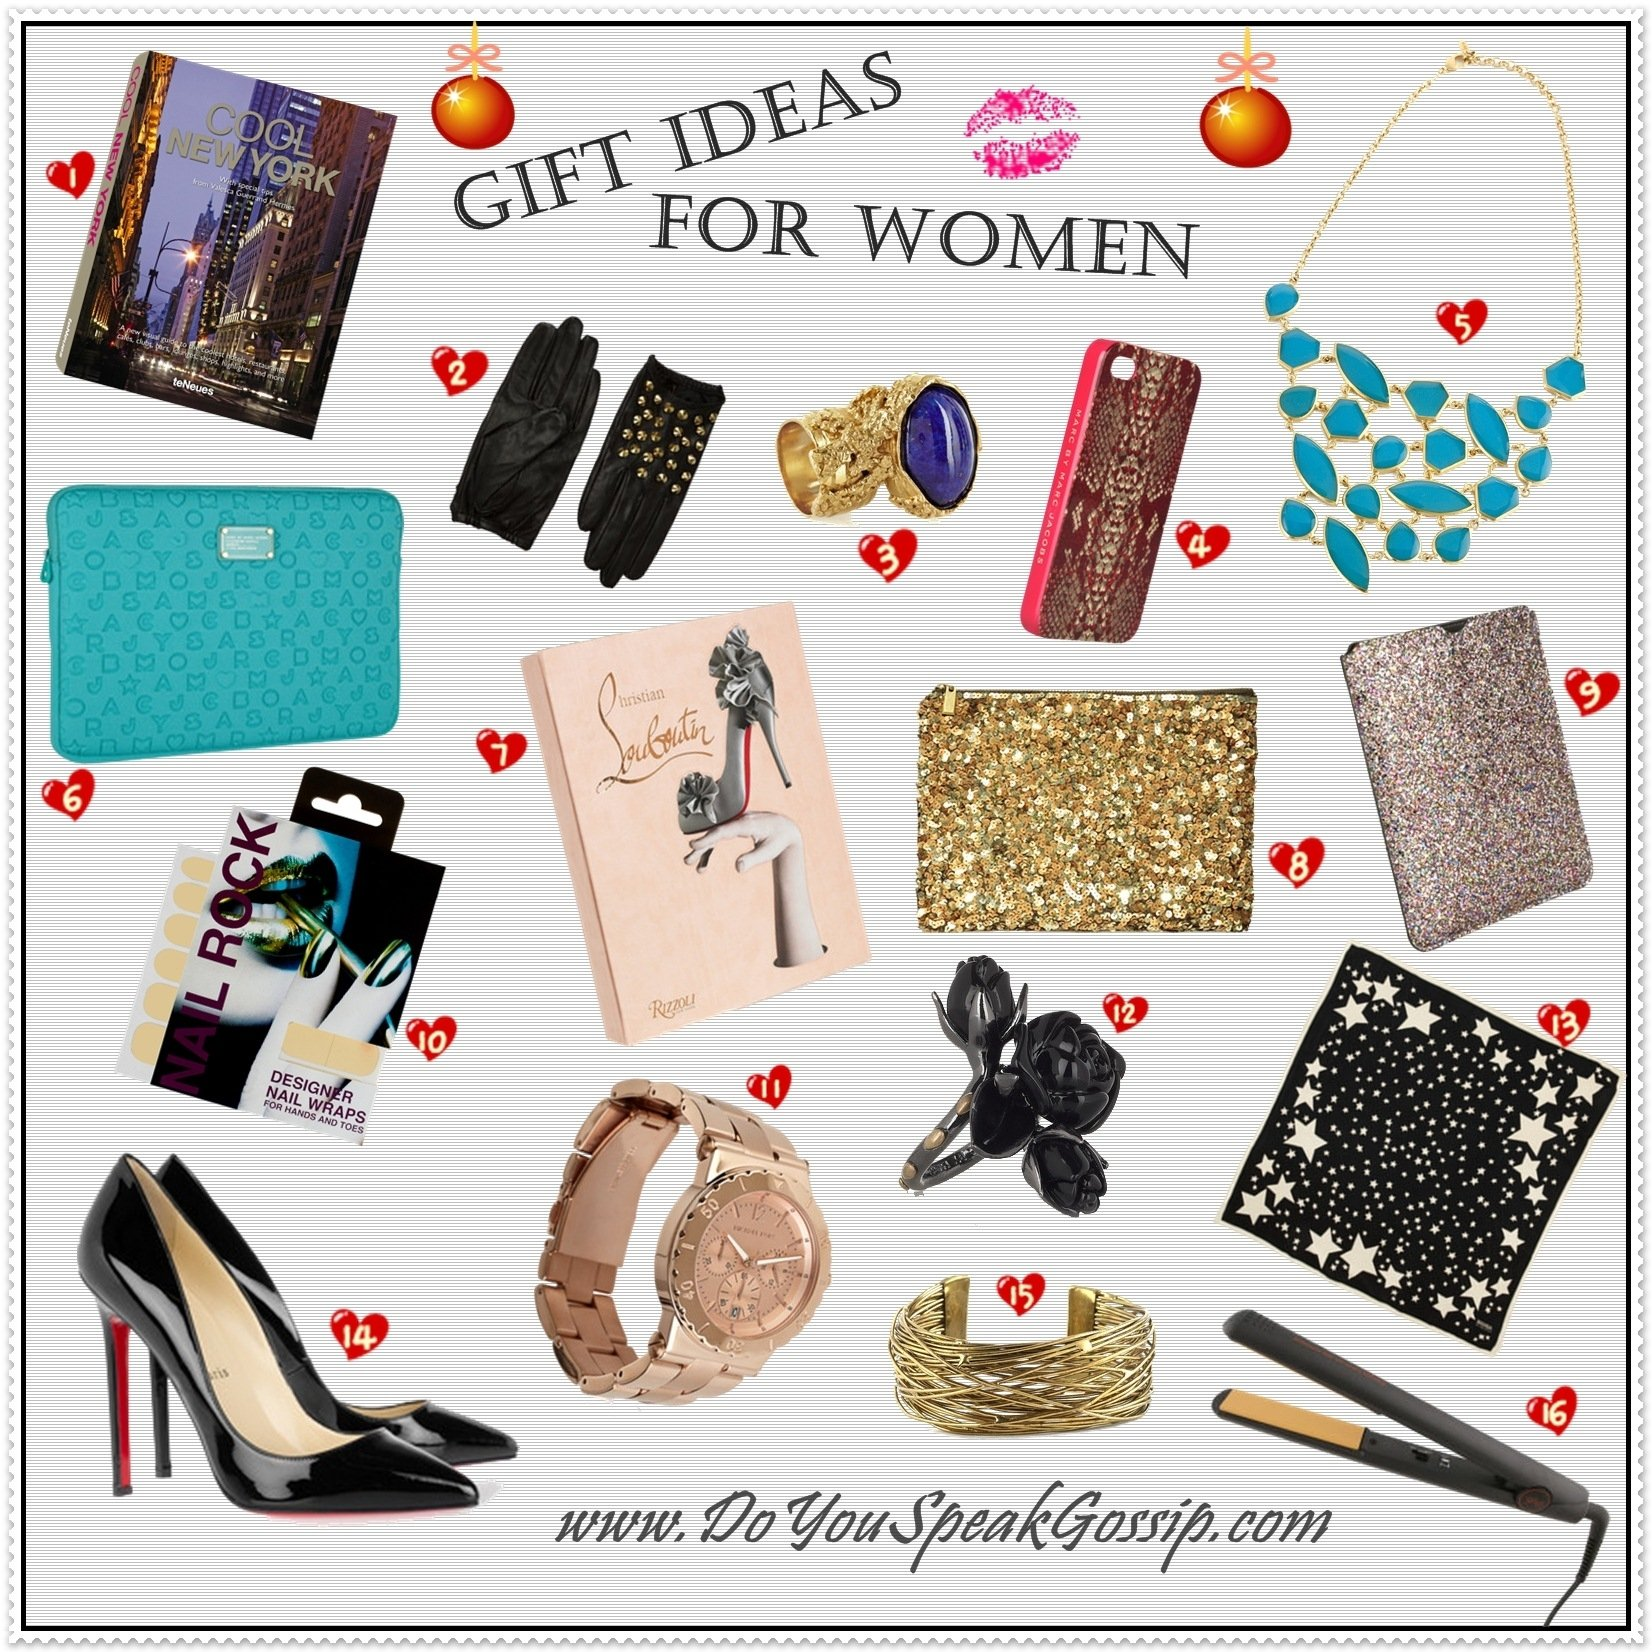 10 Wonderful Birthday Gift For Wife Ideas gift ideas for women do you speak gossipdo you speak gossip 2 2021